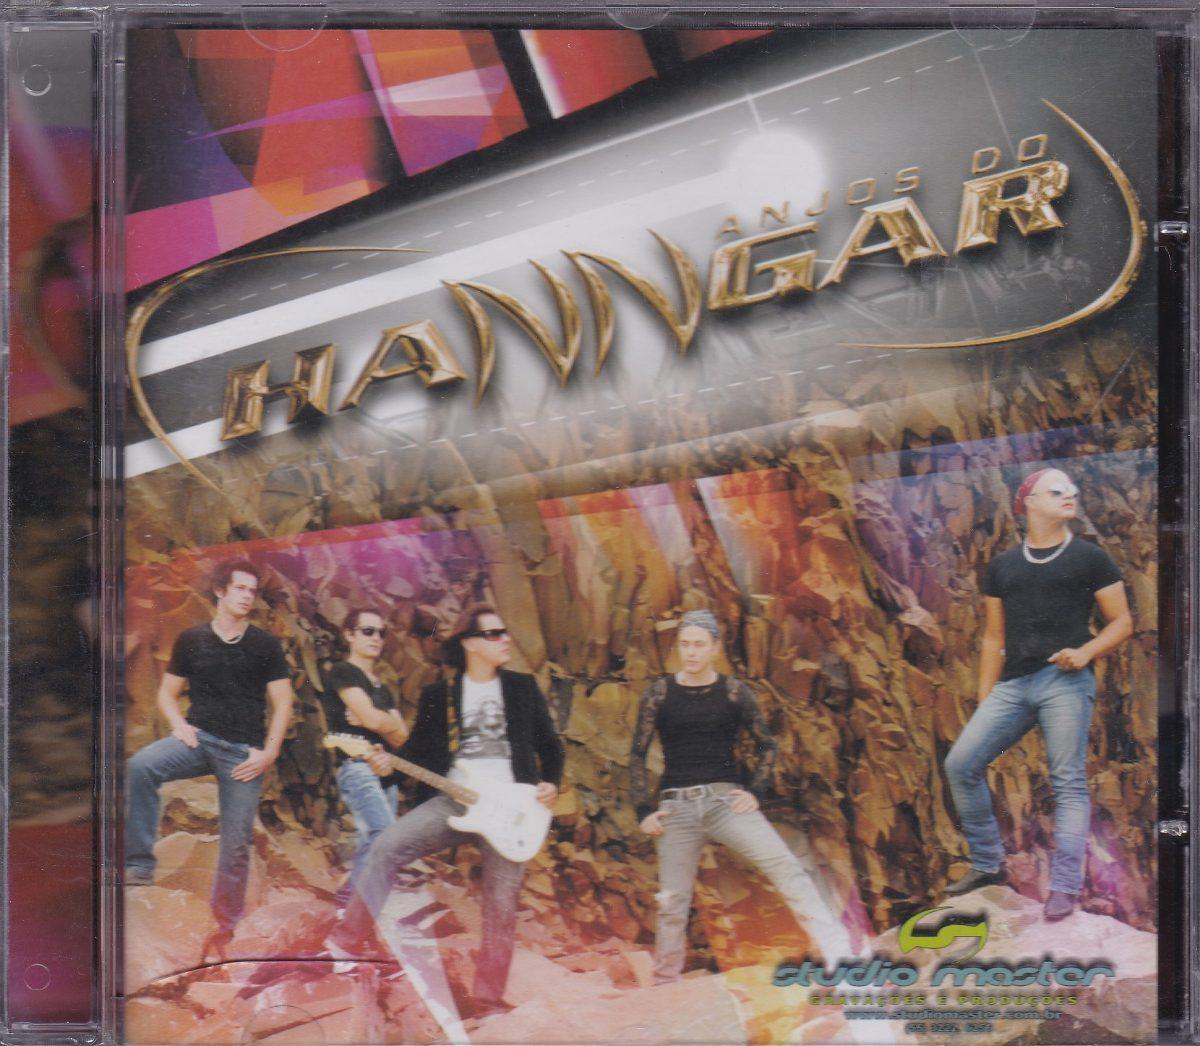 novo cd anjos do hanngar 2012